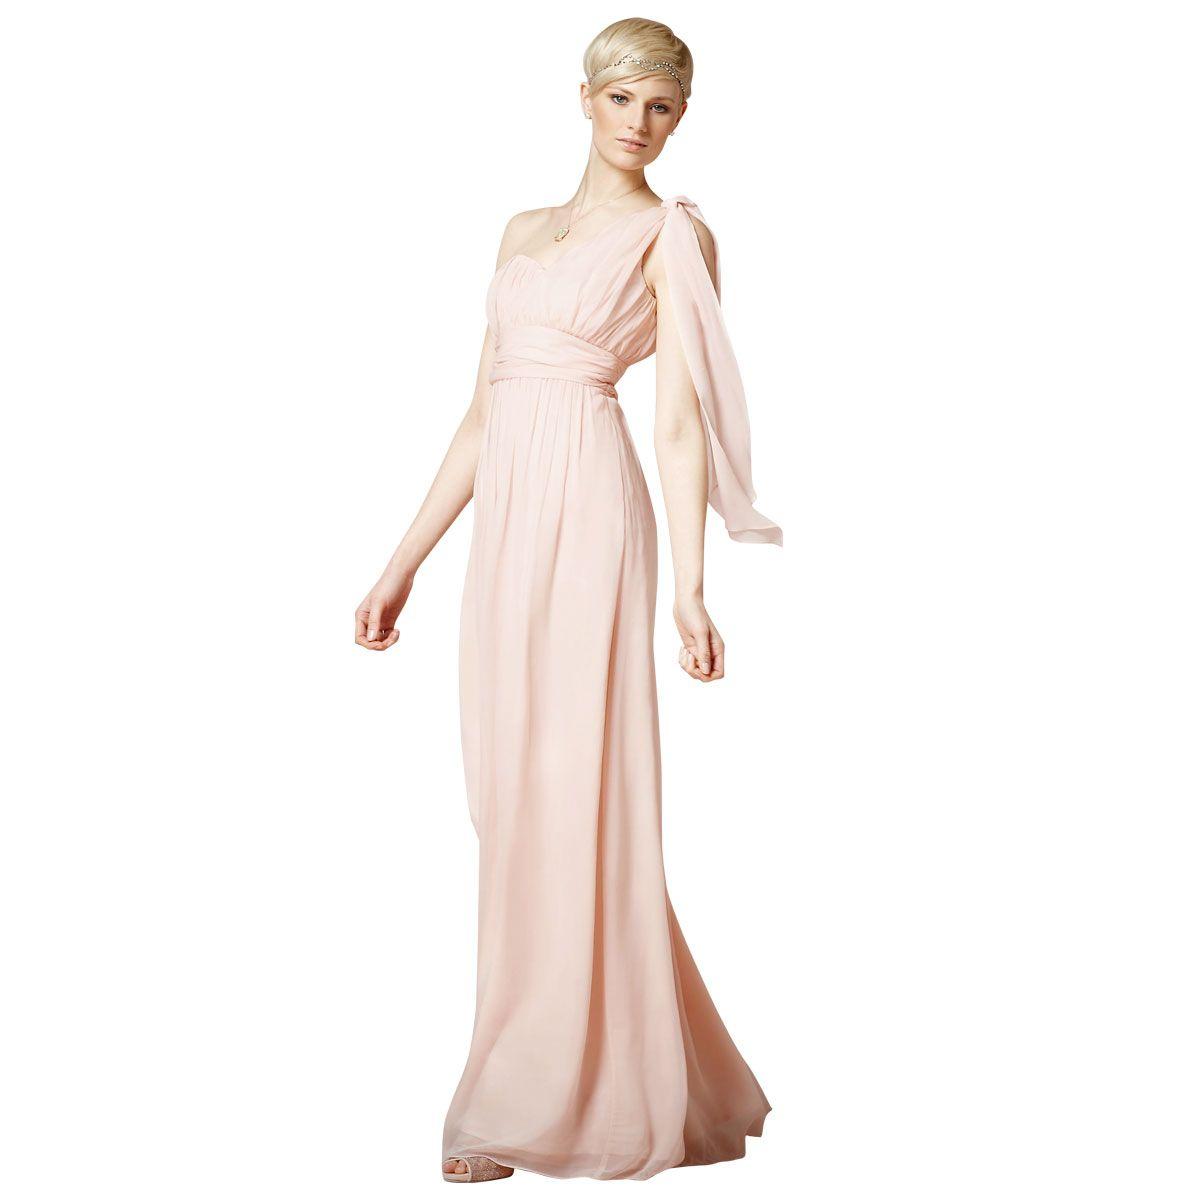 Wedding Entourage Hairstyle: 45 Stunning Nontraditional Wedding Dresses